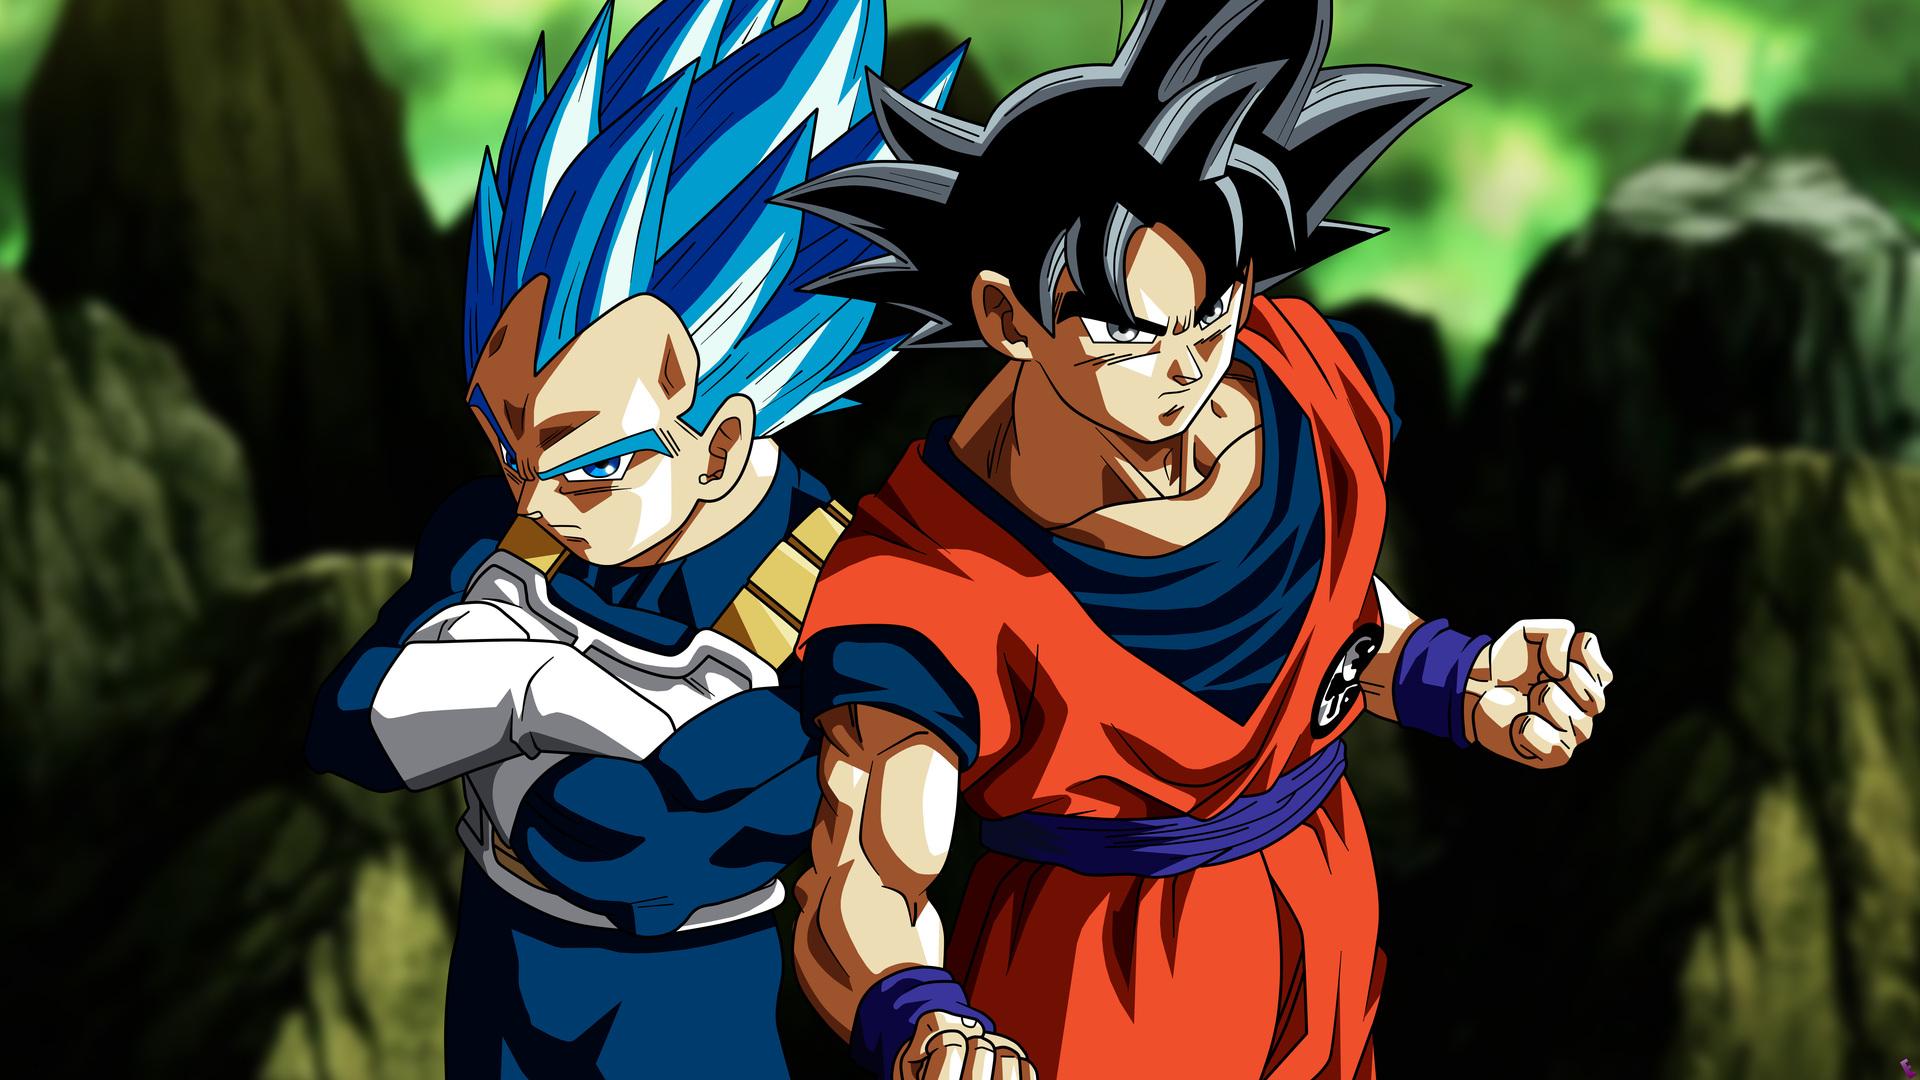 Son Goku Vegeta In Dragon Ball Super 5k